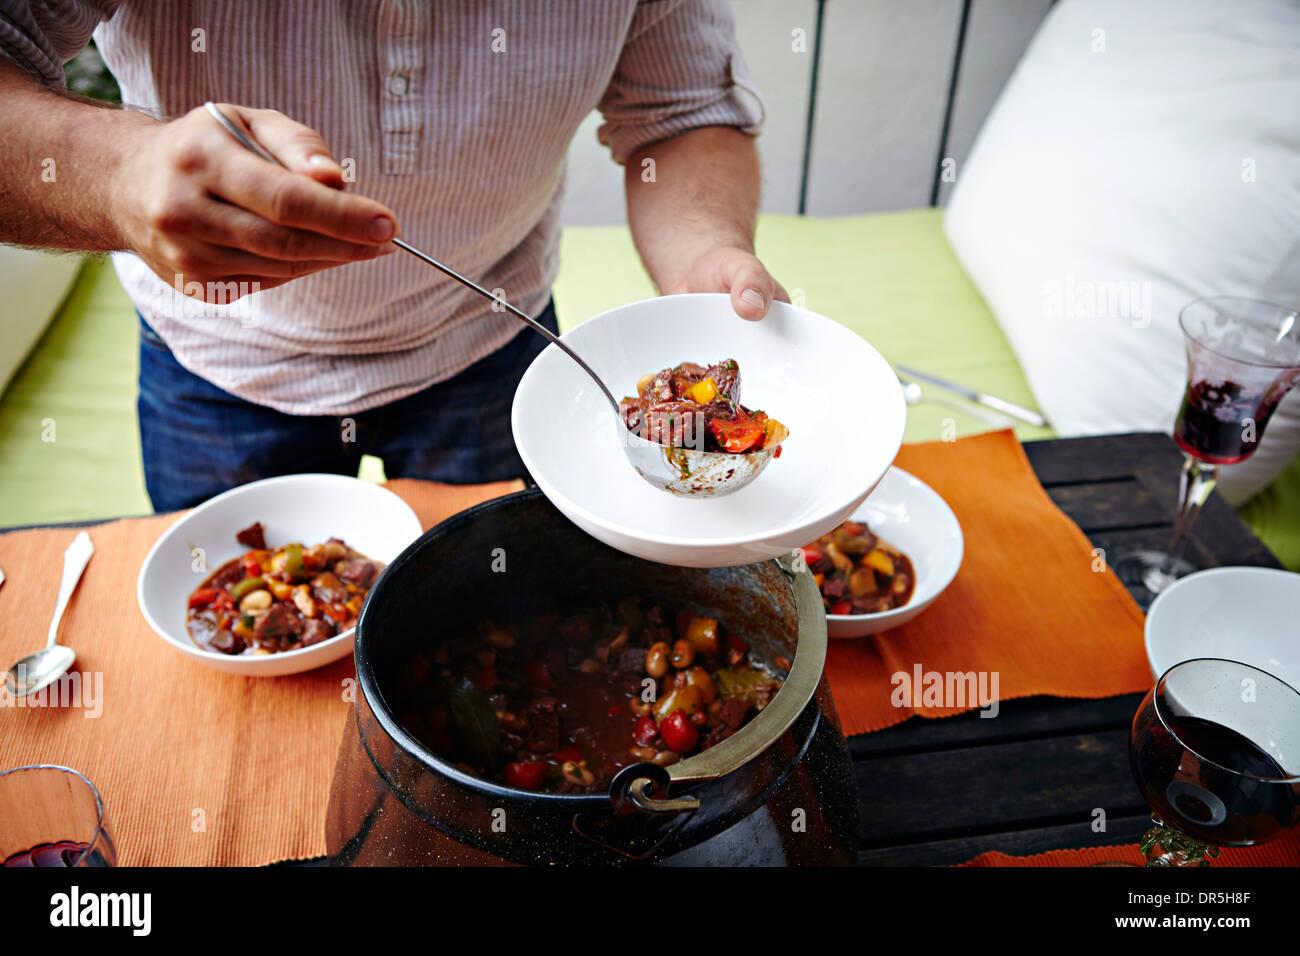 Goulash Stew - Stock Image